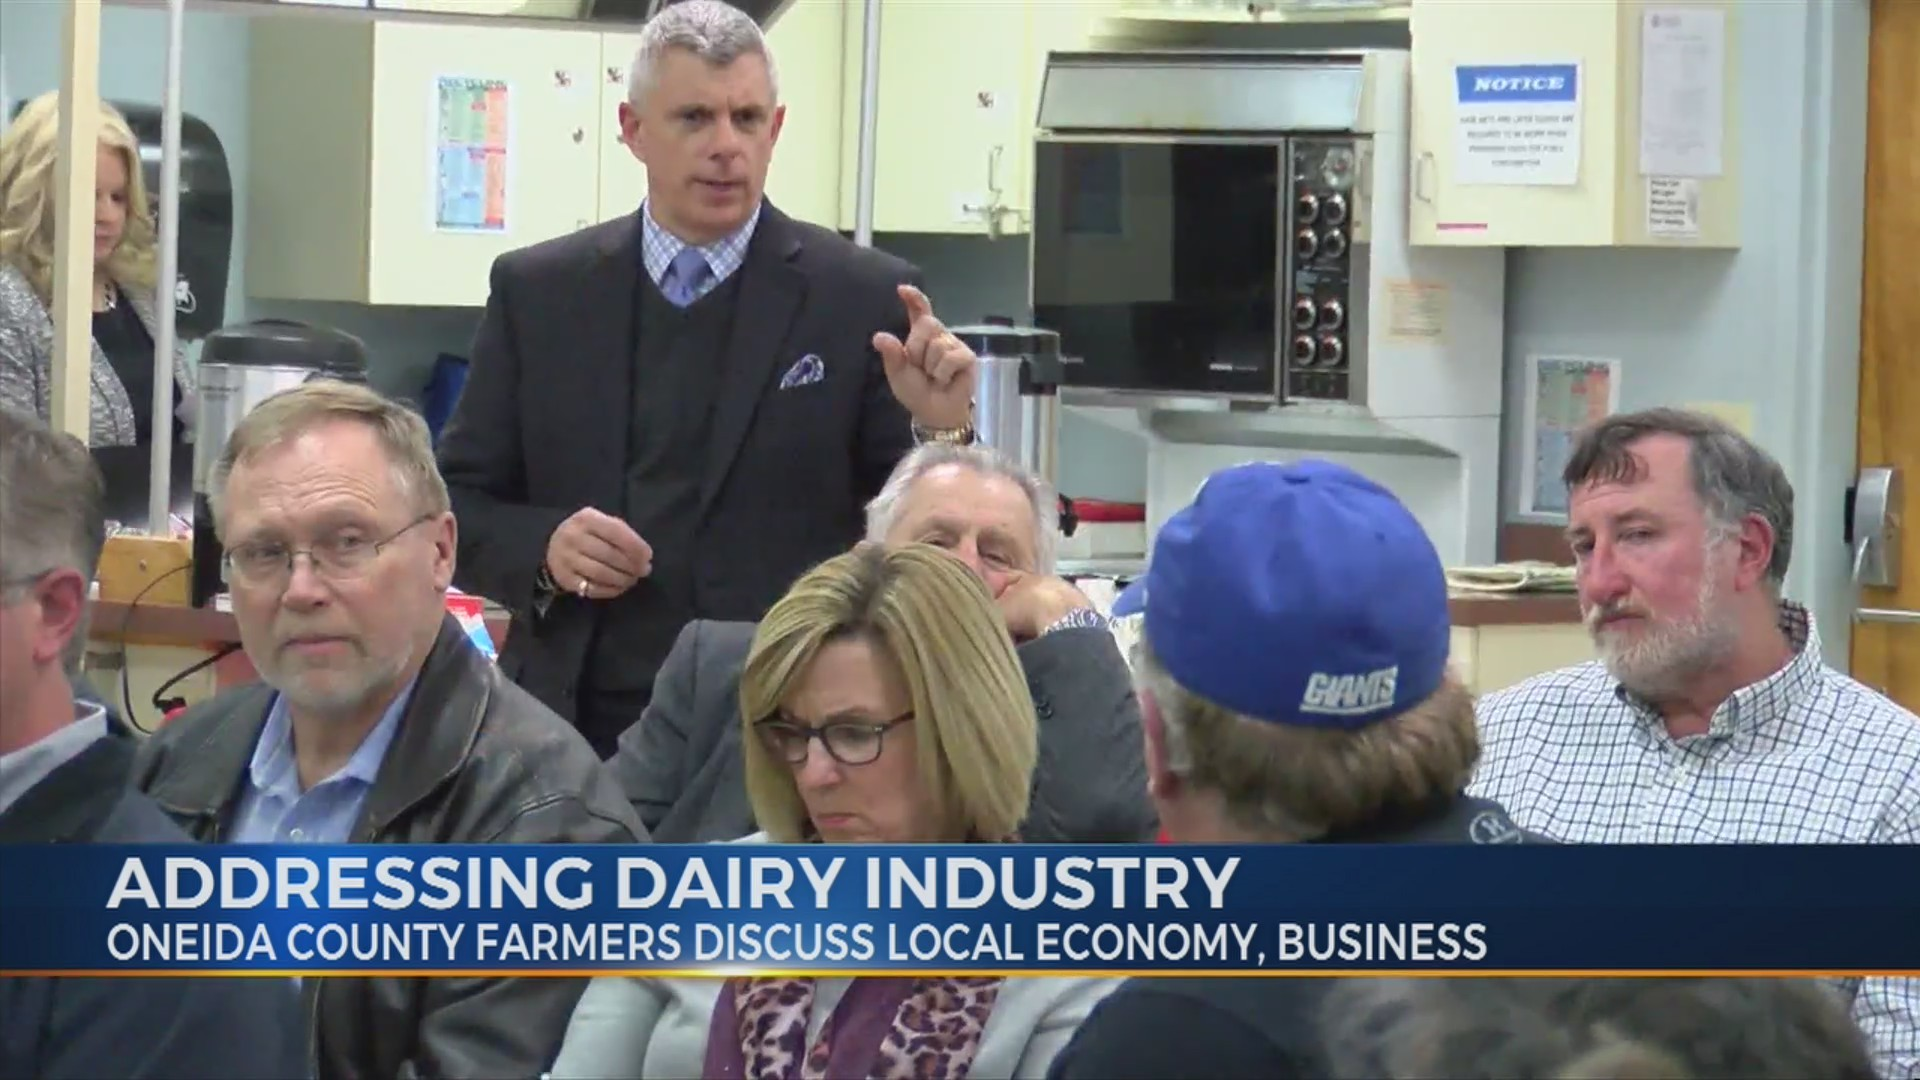 Addressing_Dairy_Industry_0_20181211231053